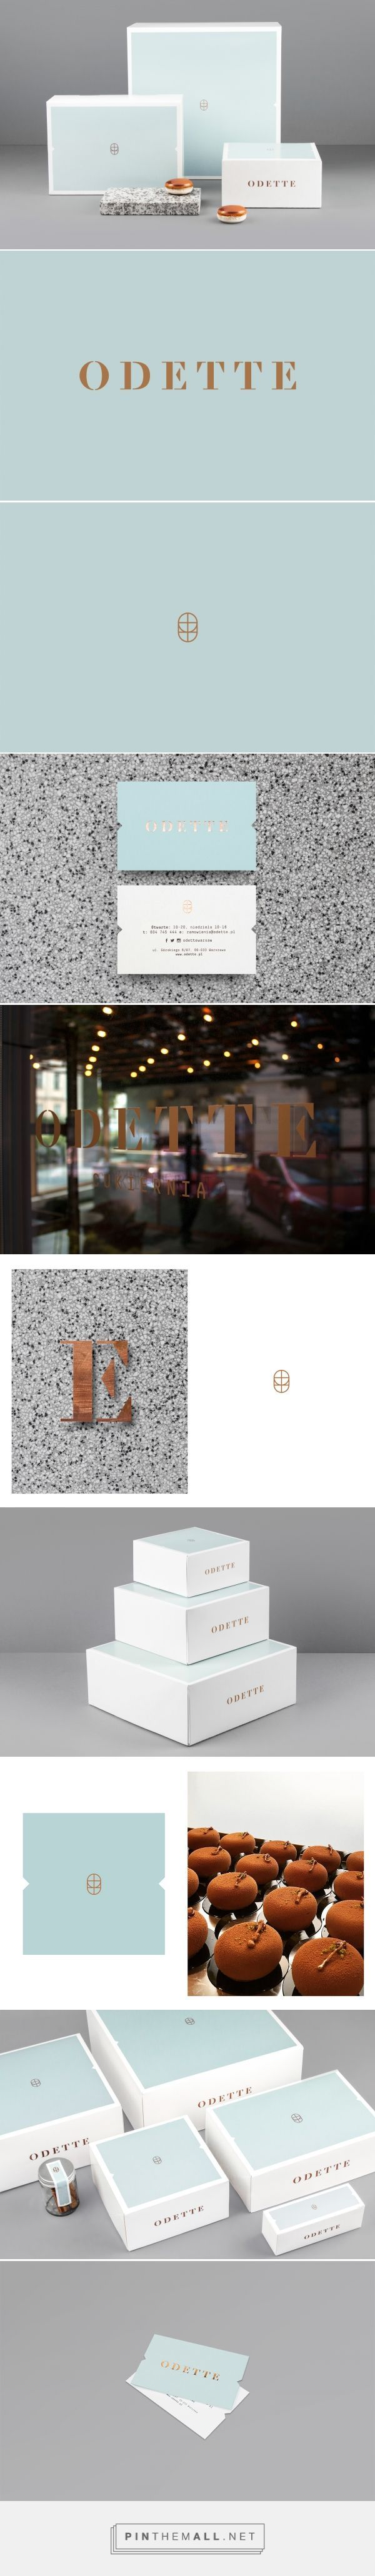 Odette | Dmowski & Co. #branding #packaging #identity